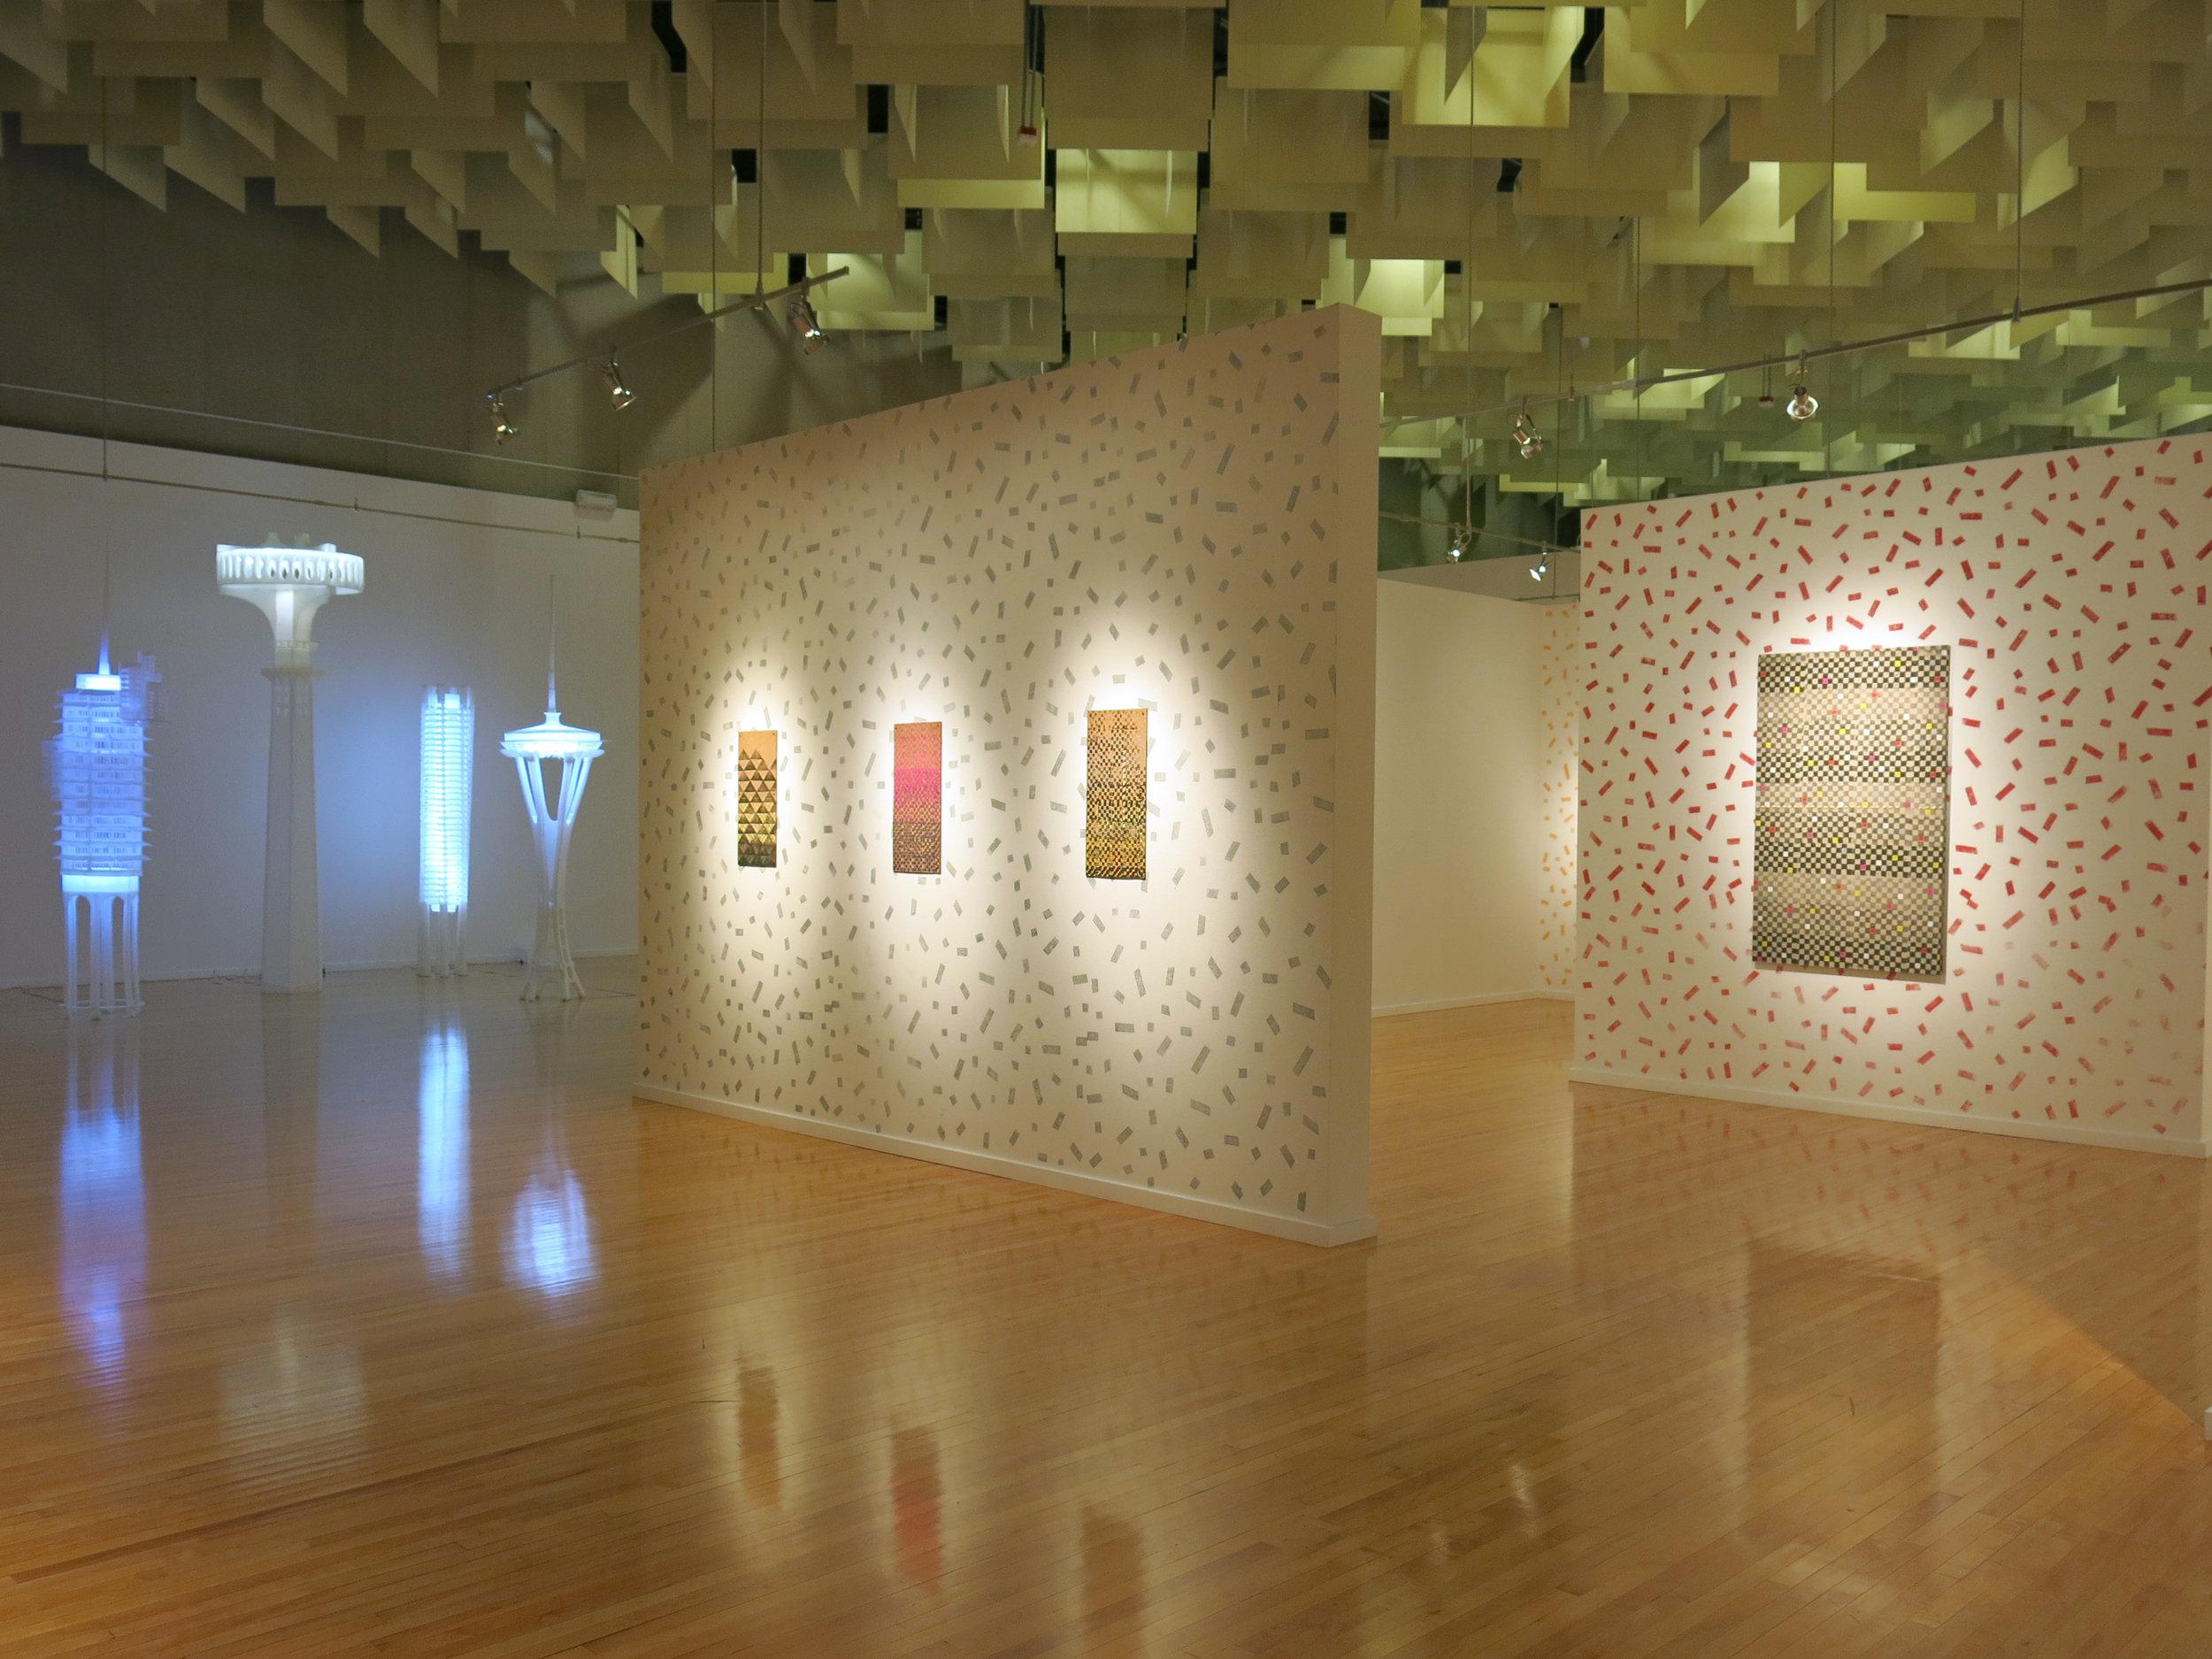 Deborah Aschheim and and Lucky DeBellevue installation, Five at the Marjorie Barrick Museum. Image courtesy Marjorie Barrick Museum.